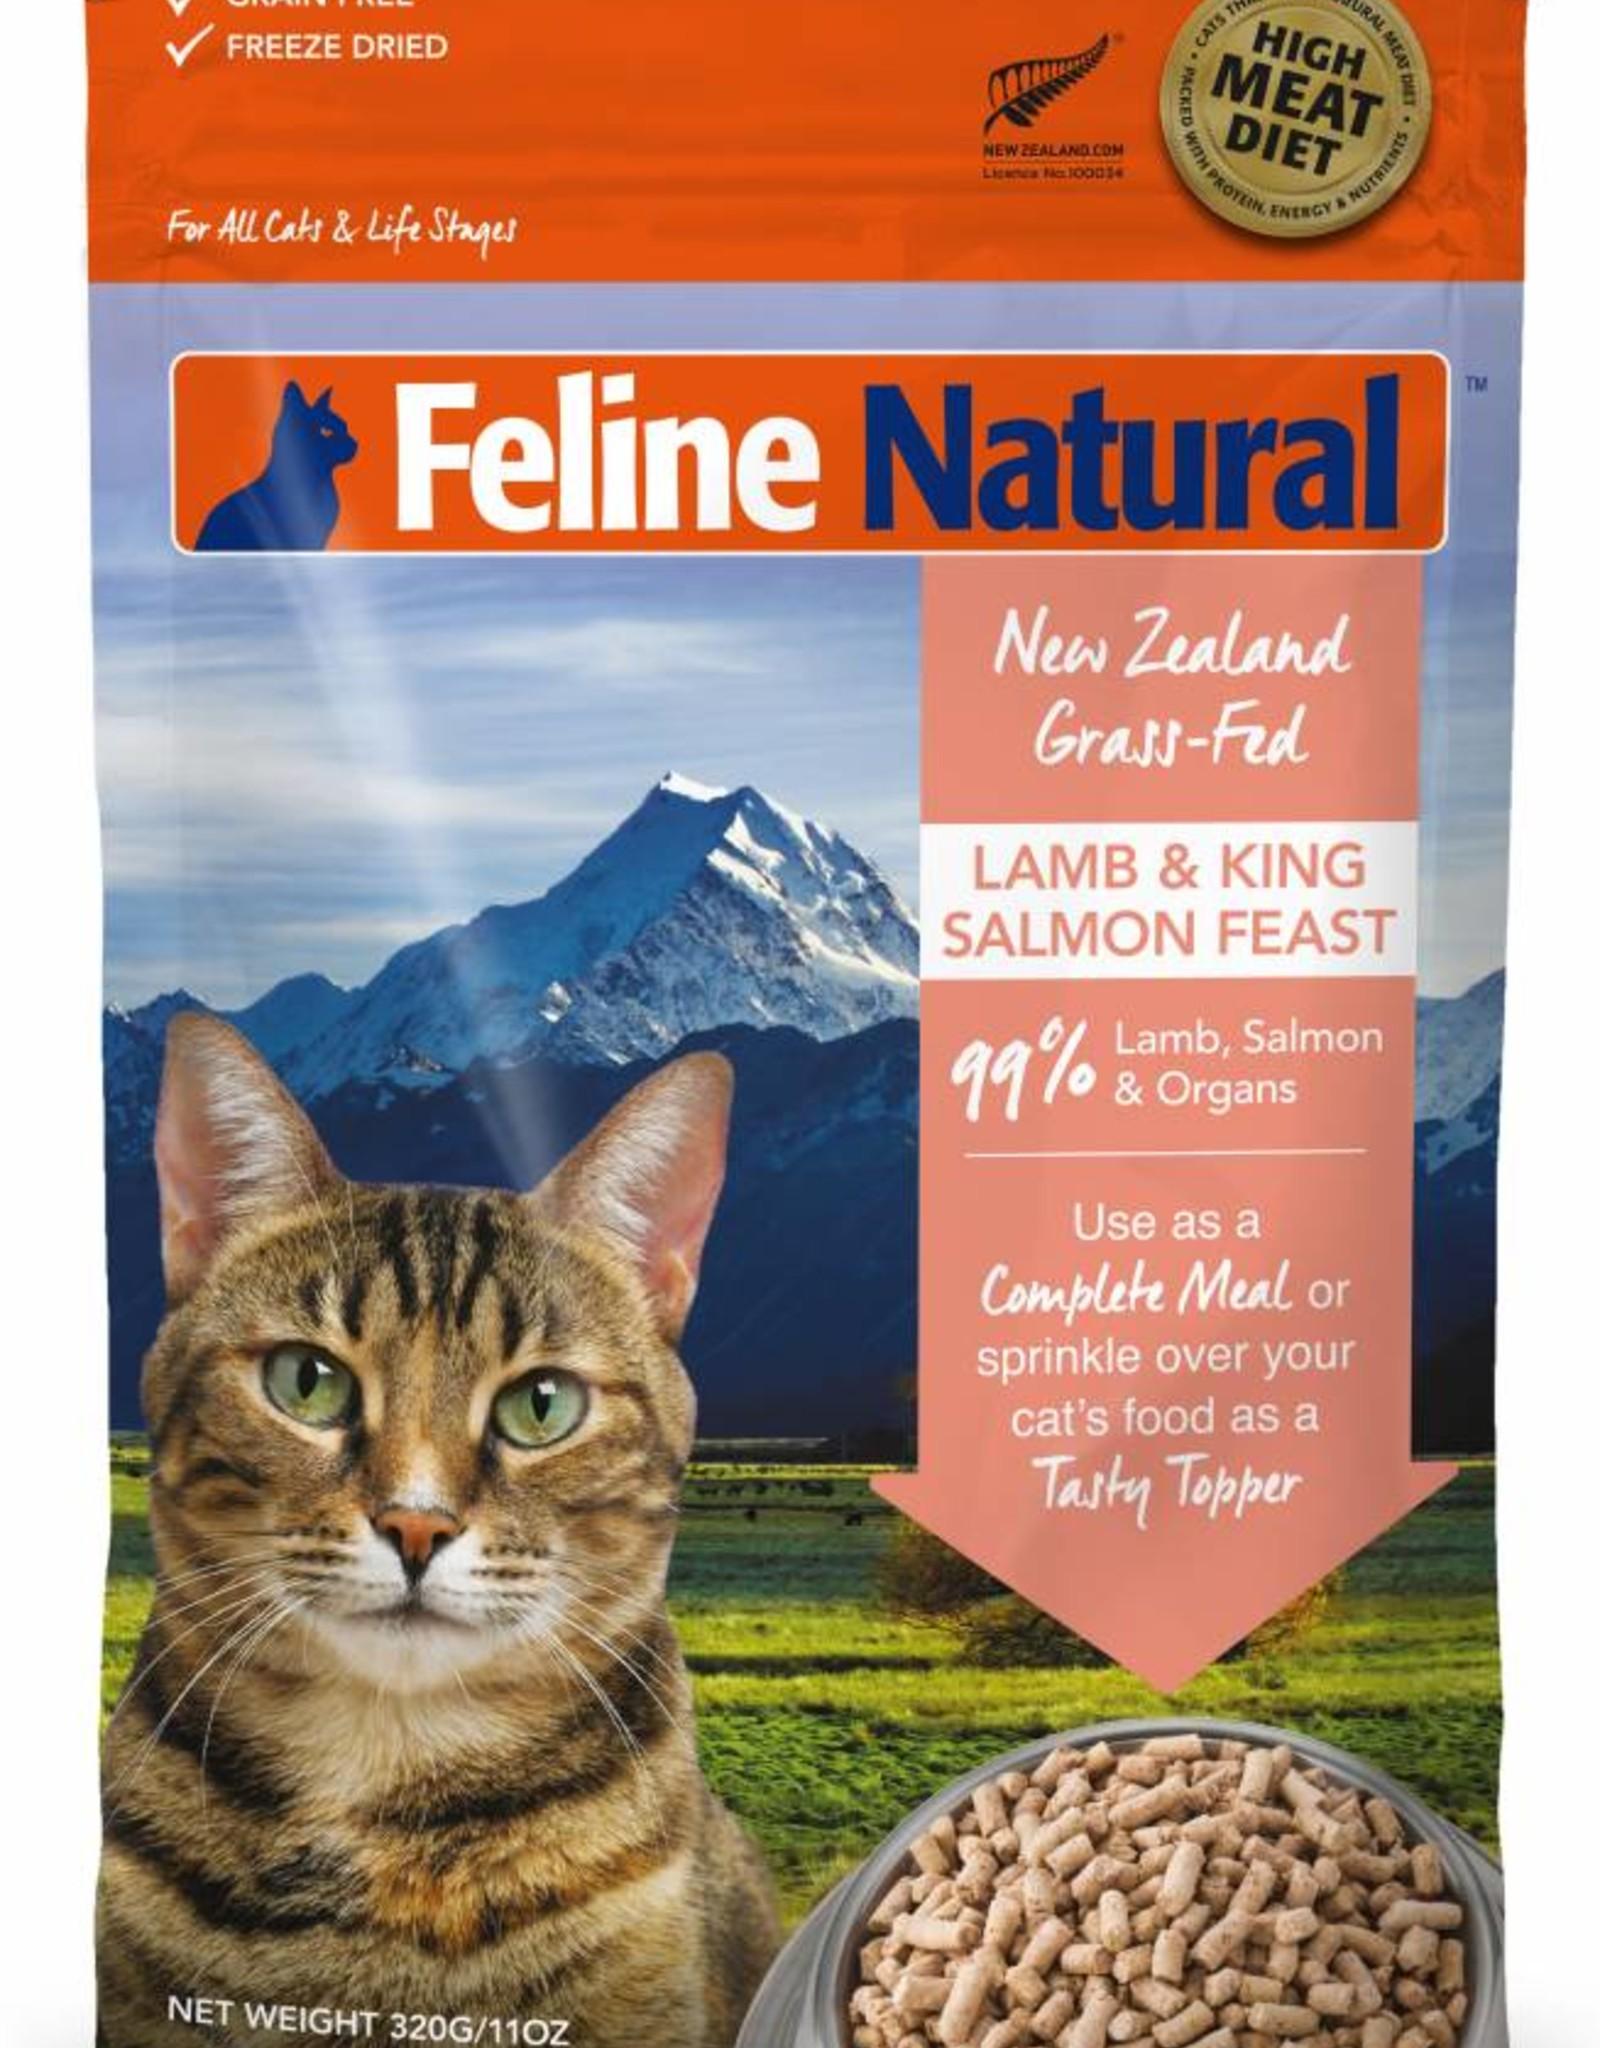 K9 Natural Feline Natural Freeze-Dried Lamb & King Salmon Feast